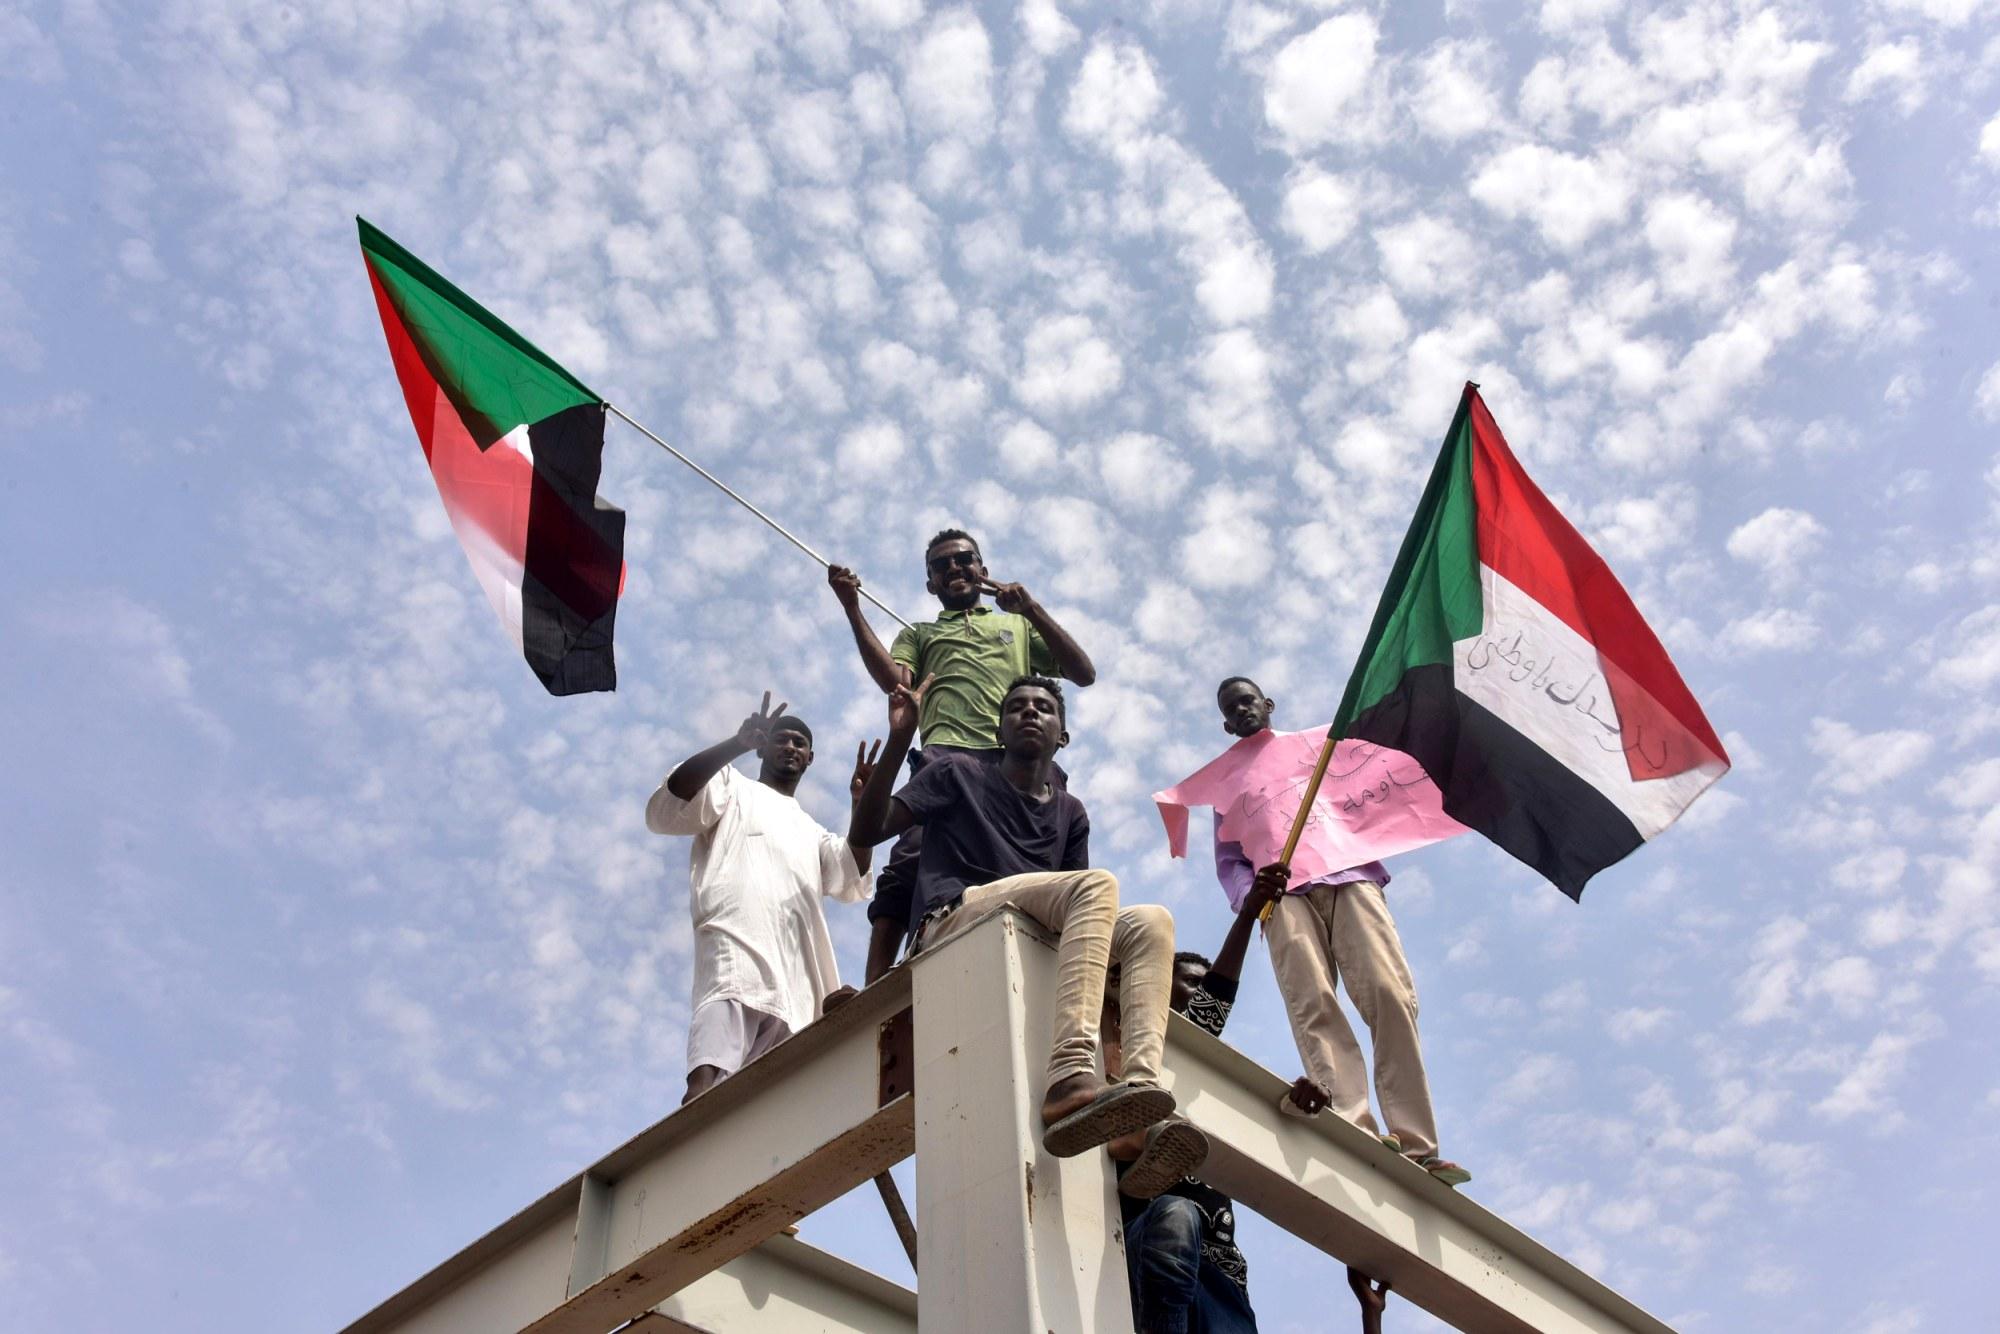 190908-sudan-government-transition-cs-128p_0815e615c189337e3ed286af92dc74fd.fit-2000w.jpg